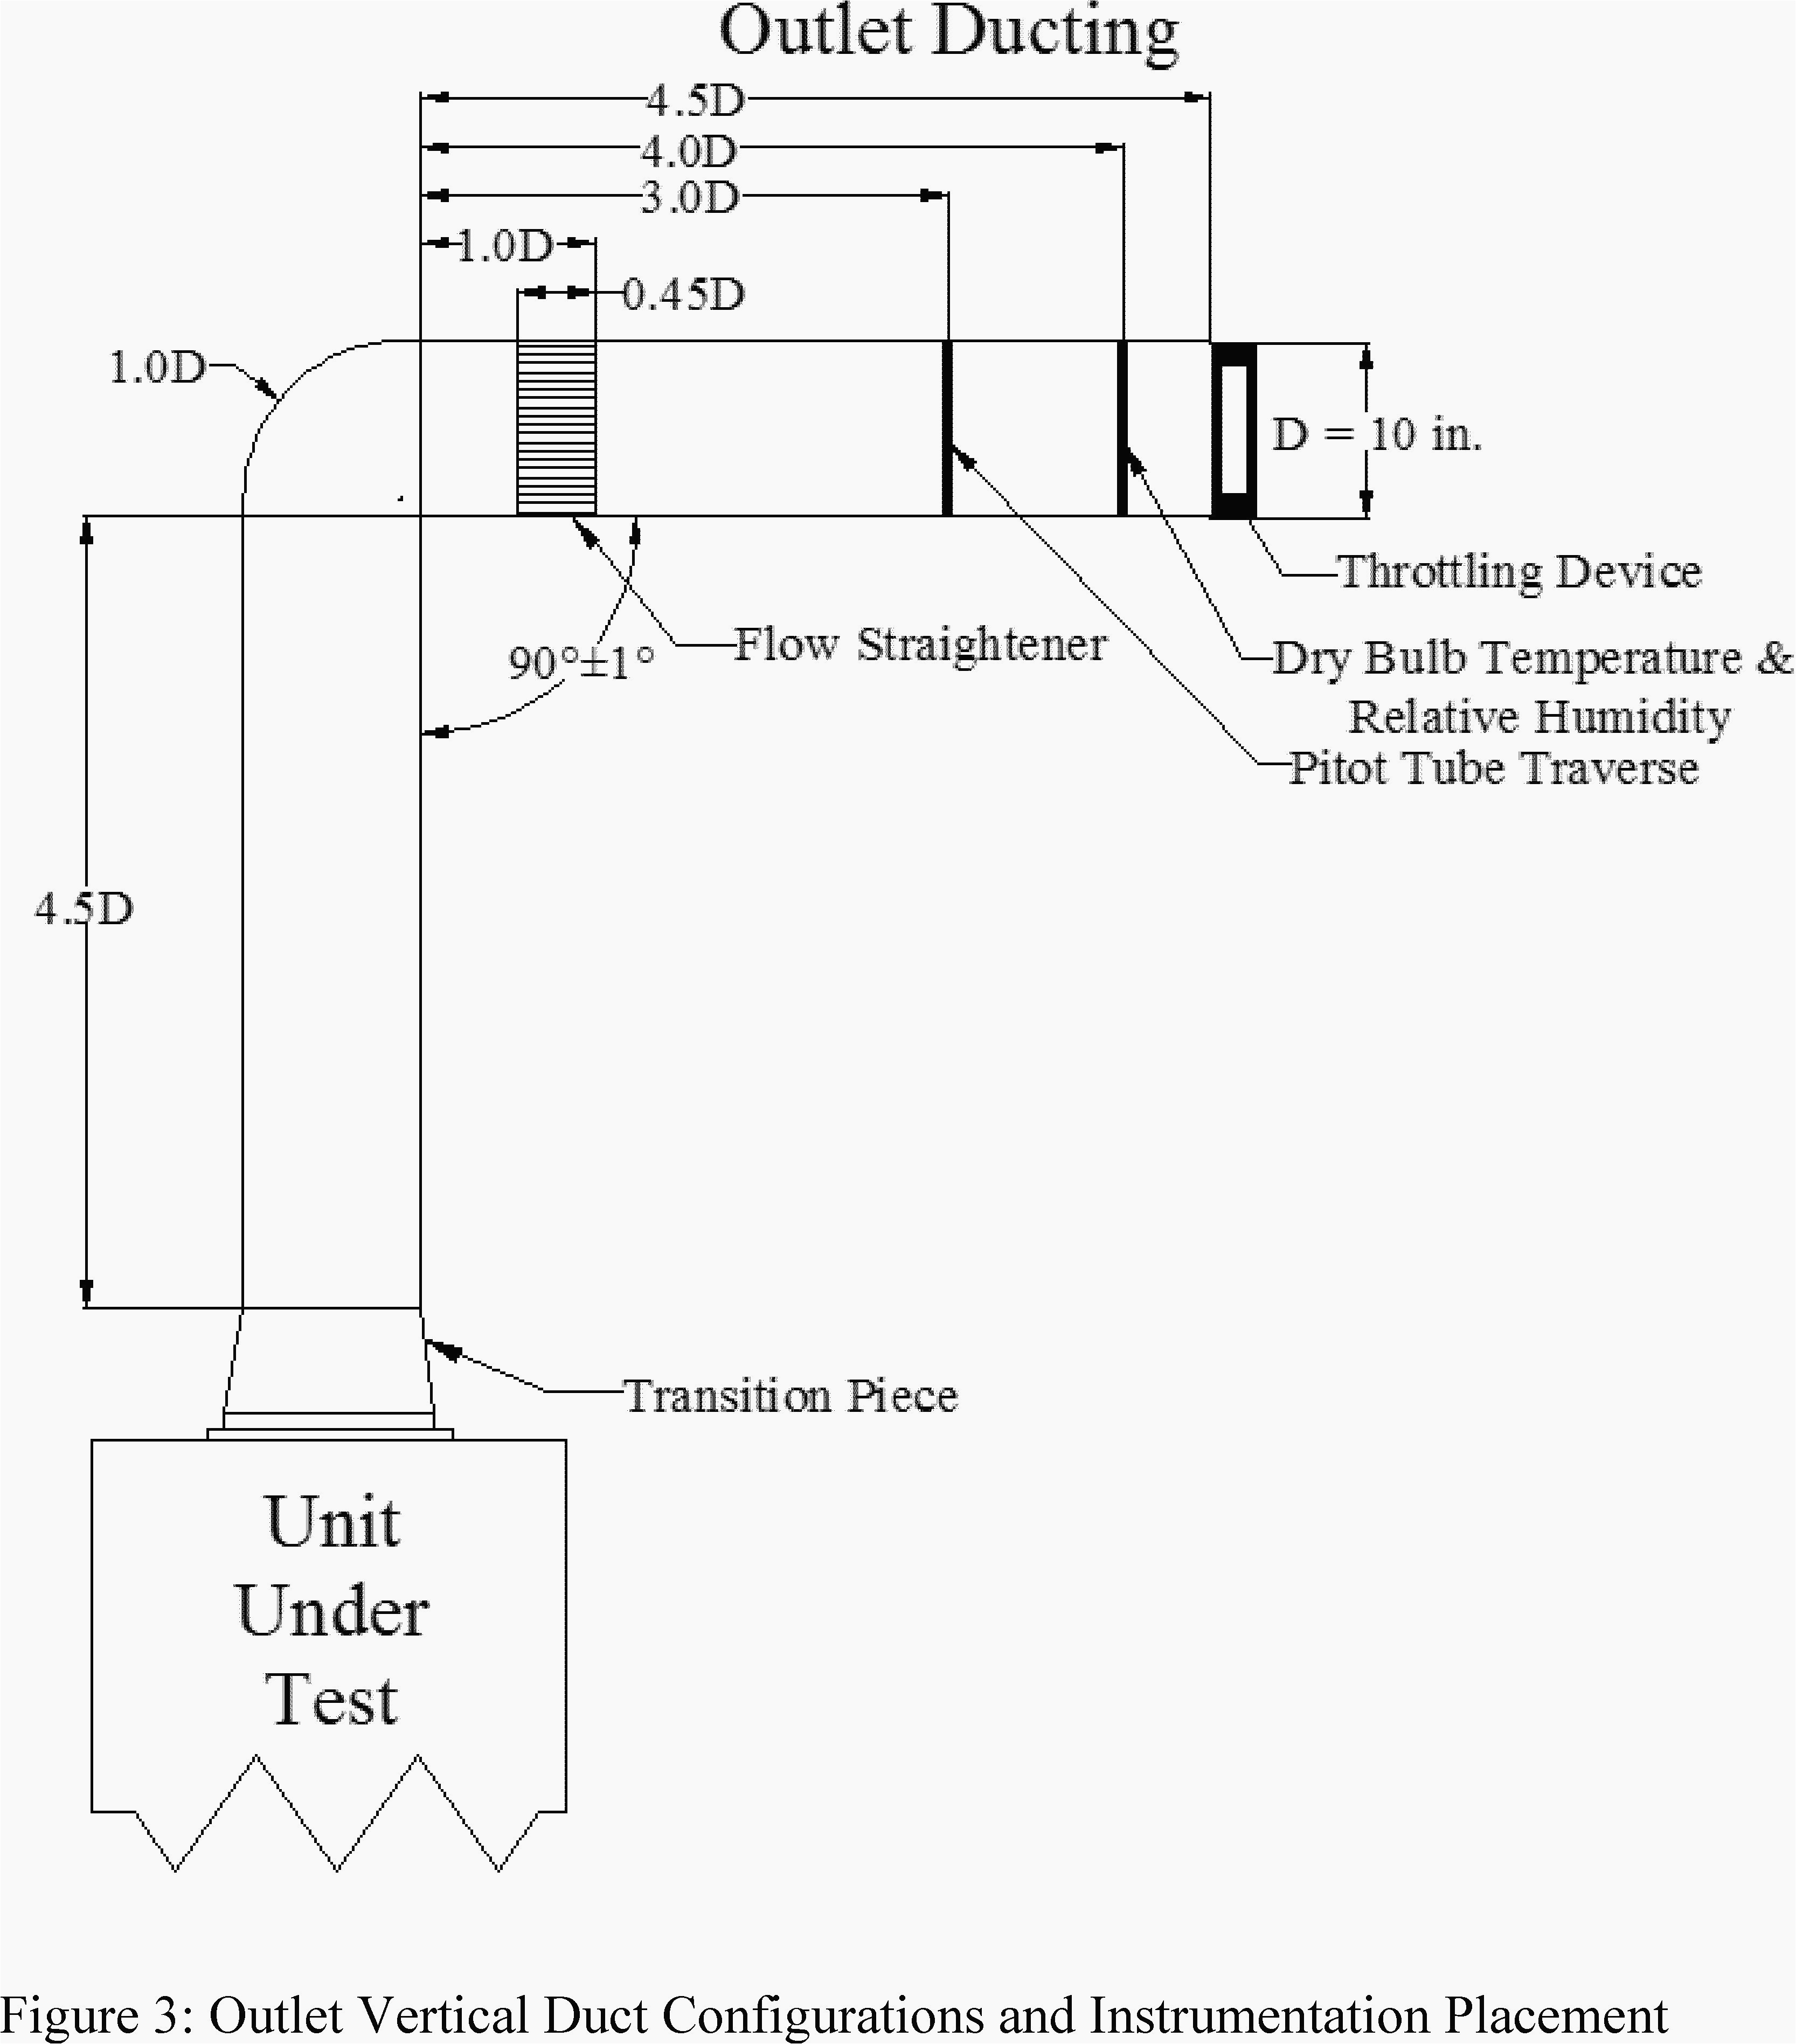 dewalt wiring diagram 1 wiring diagram source dewalt wiring diagrams data wiring diagramdw705 wiring diagram wiring